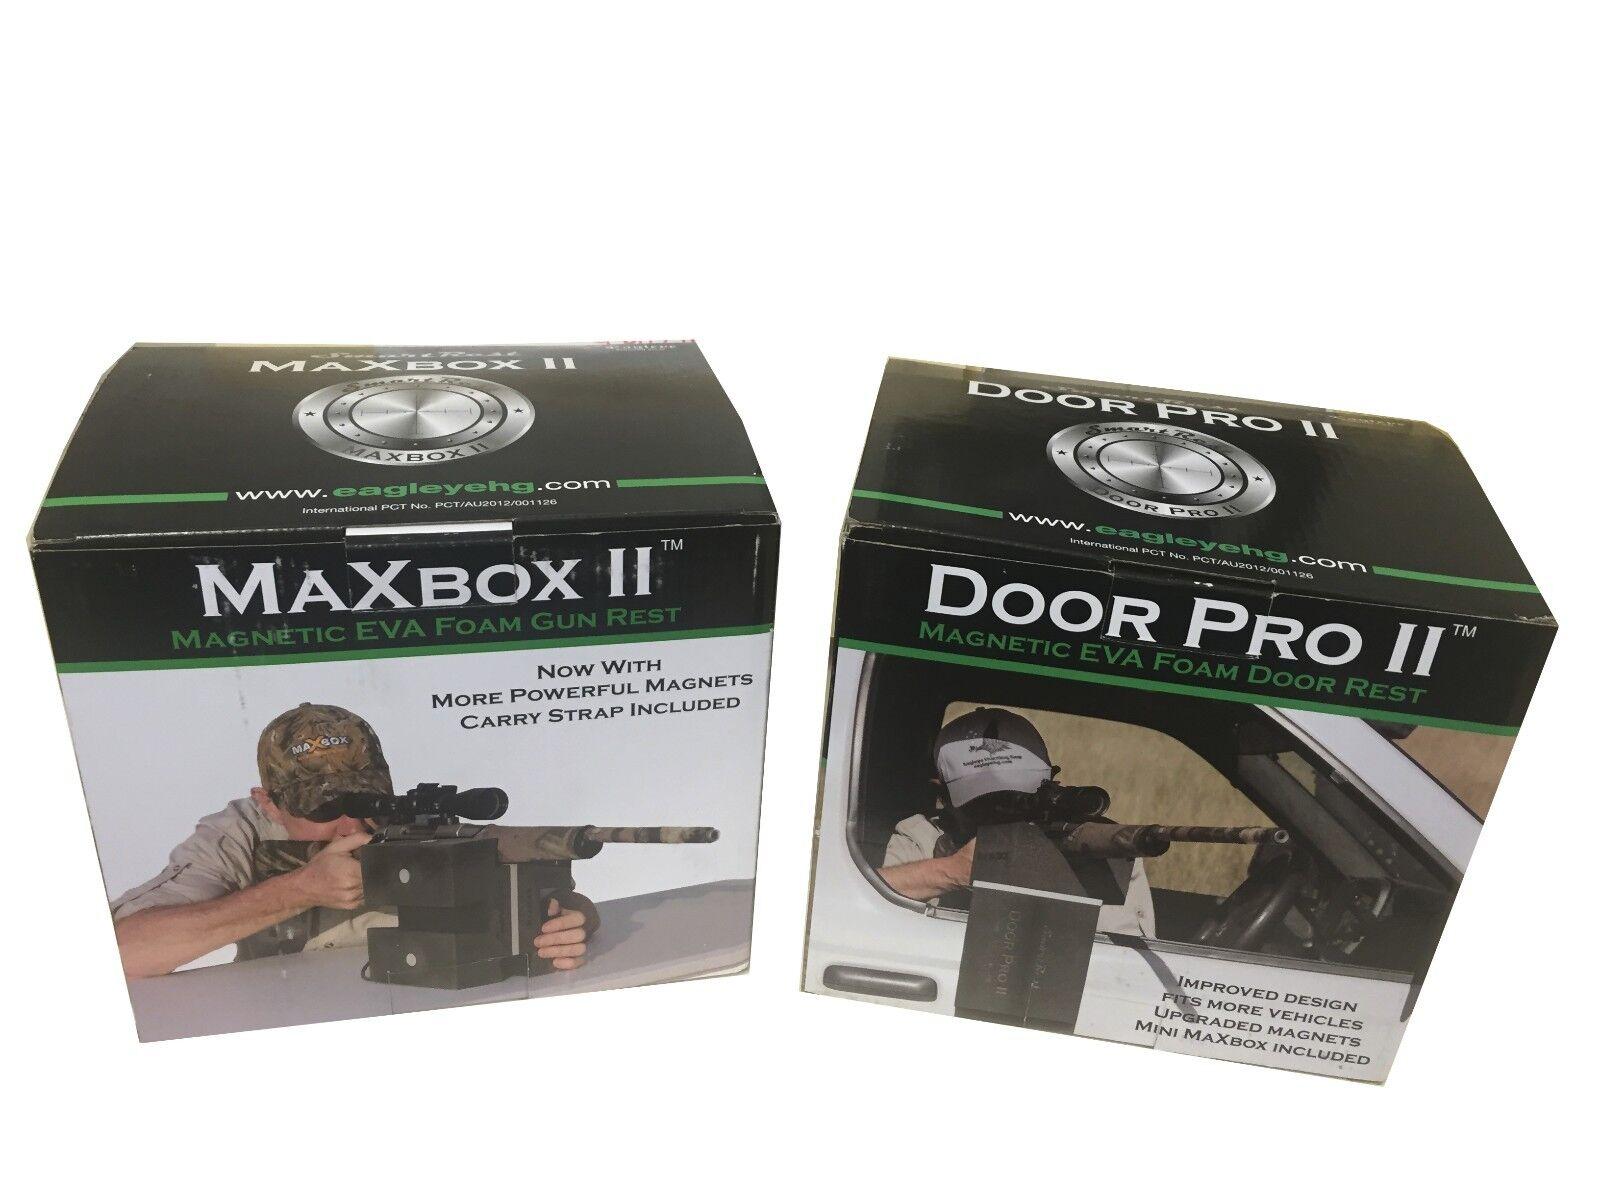 MaXbox II and Door Pro II Combo Deal - SmartRest Rifle Rests - NEW